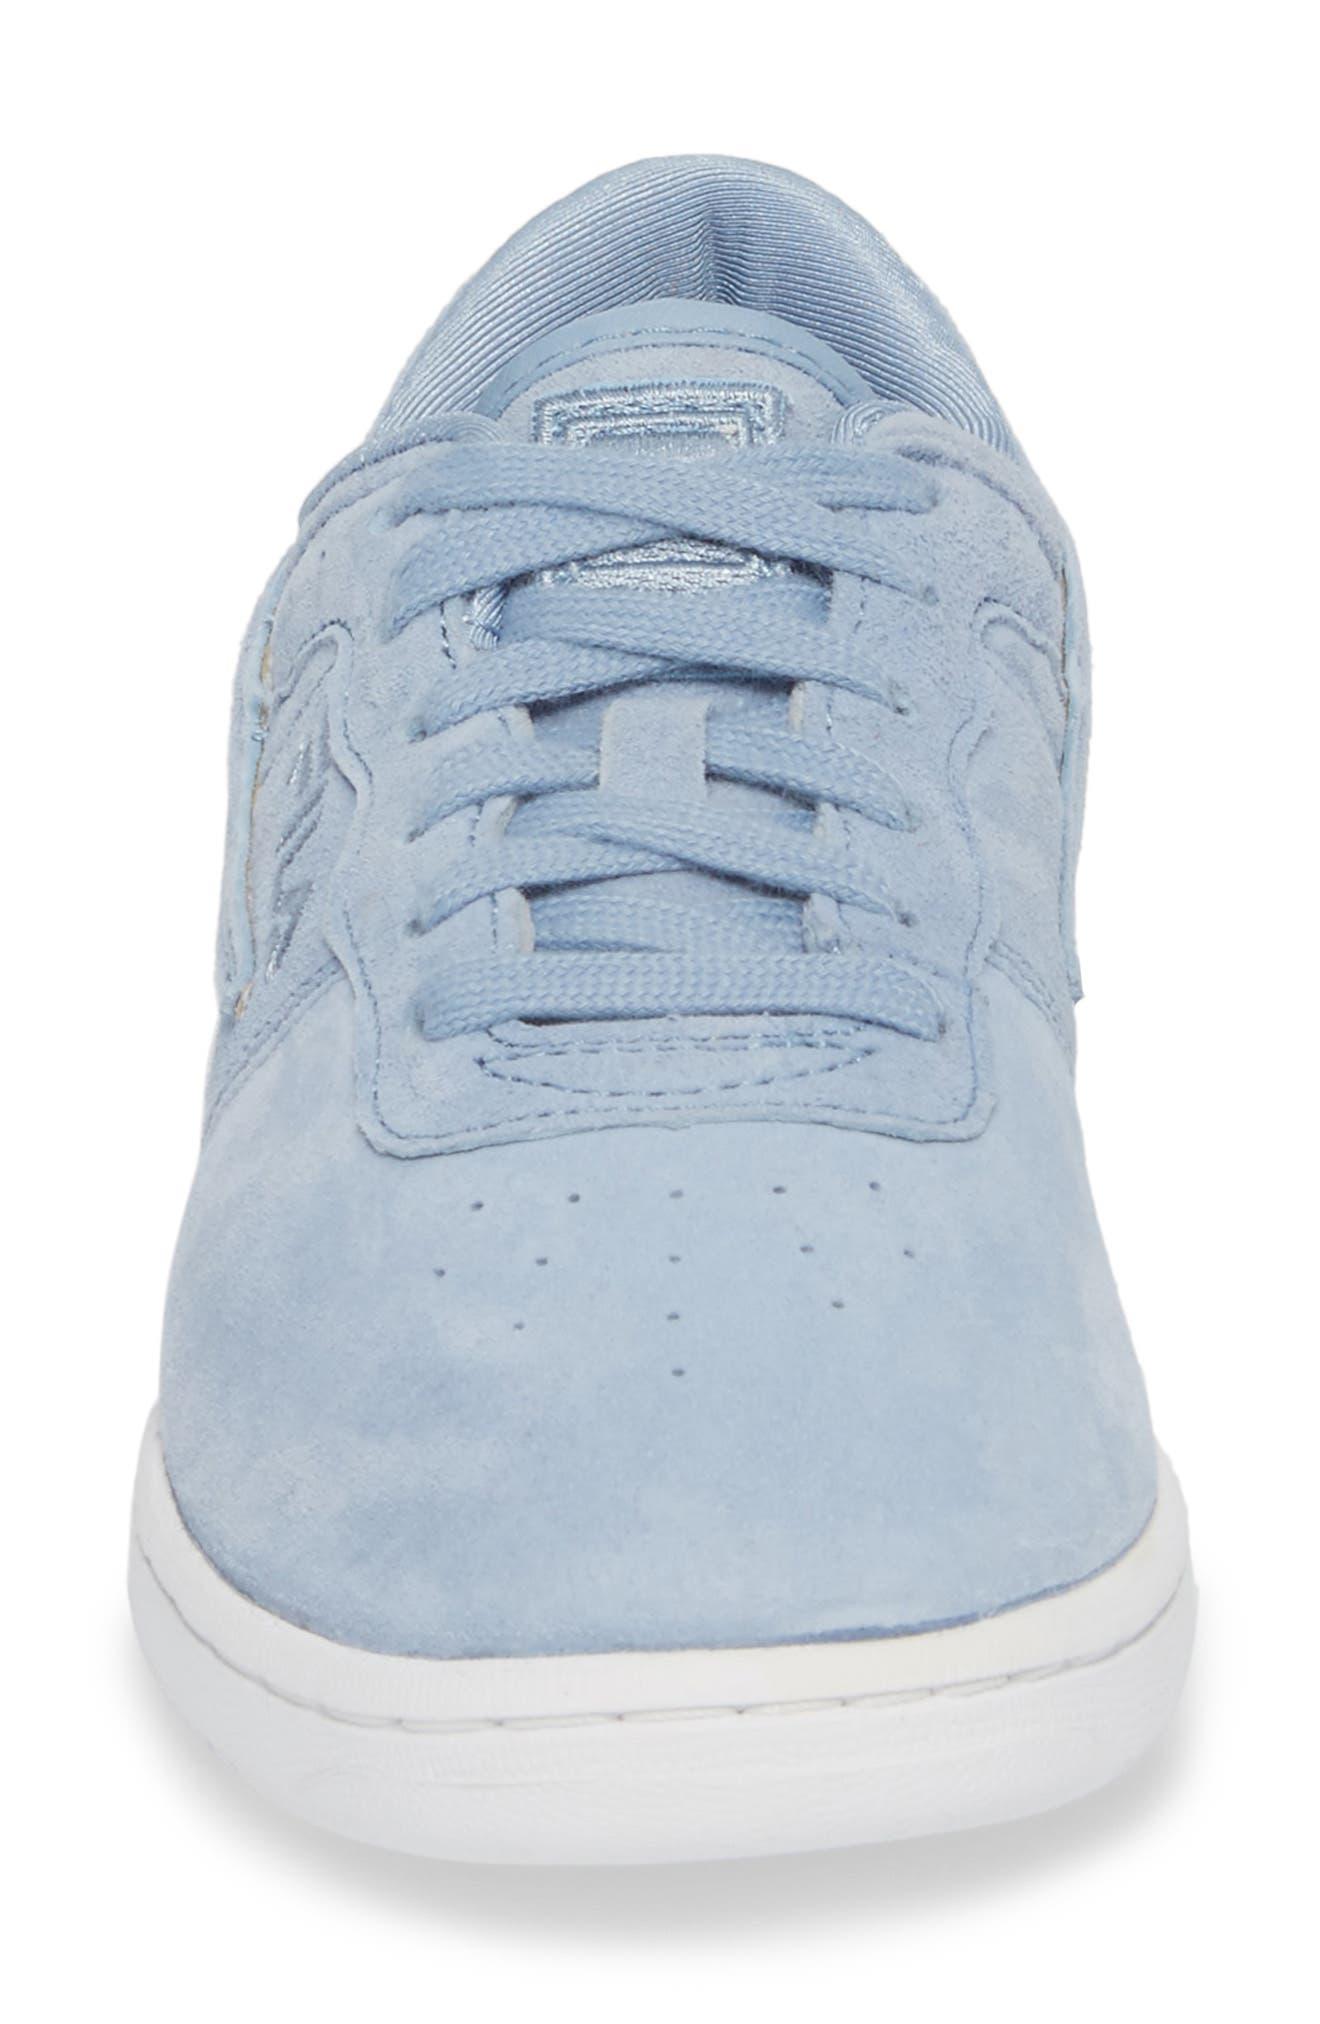 Original Fitness Premium Sneaker,                             Alternate thumbnail 4, color,                             BLUE/ WHITE